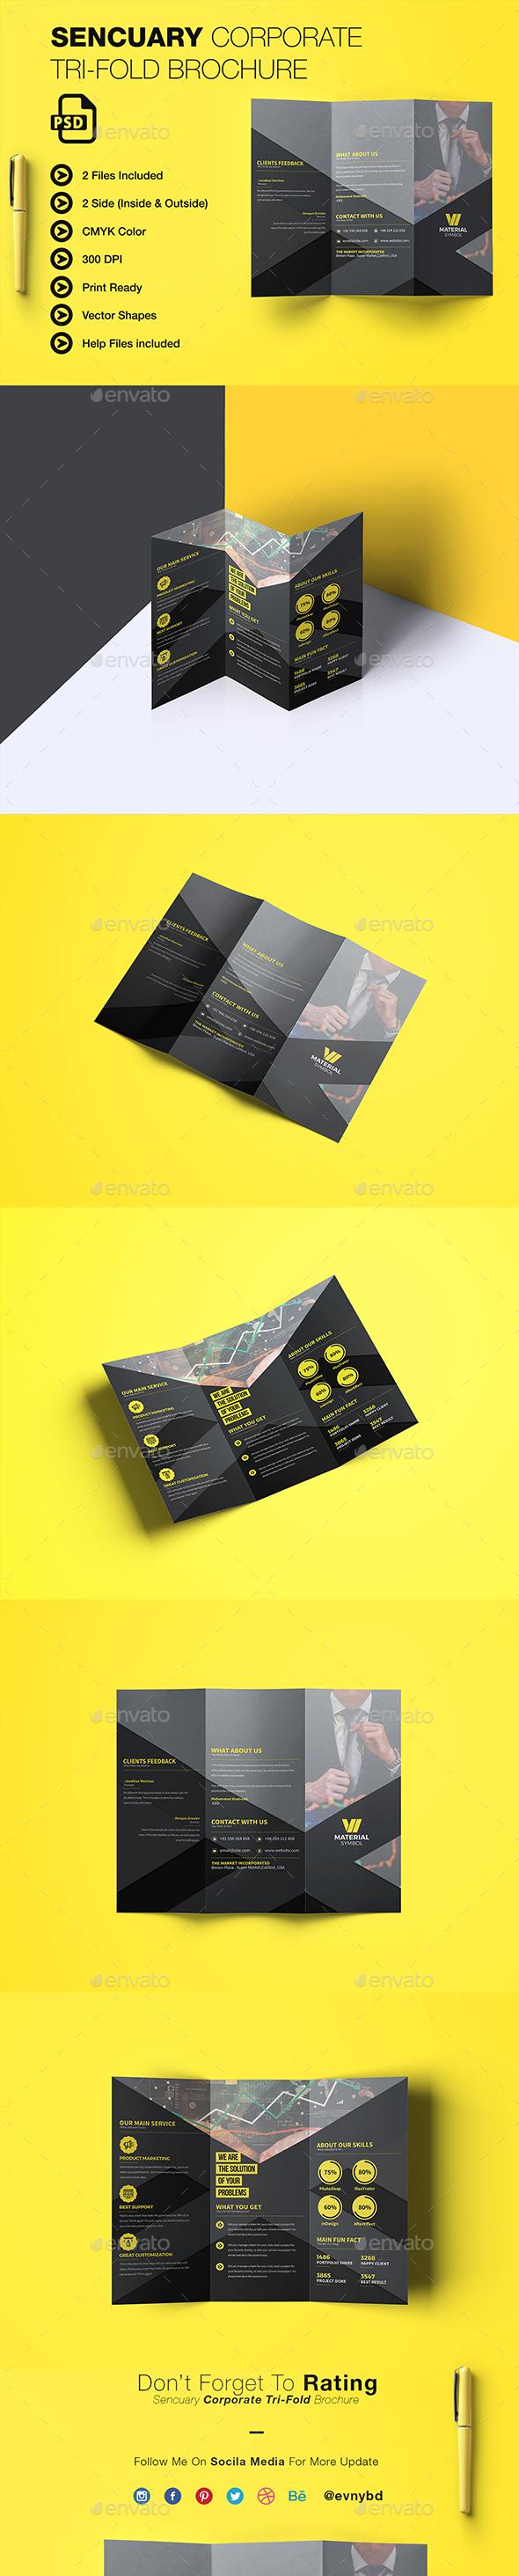 Sencuary Coporate Tri-fold Brochure - Brochures Print Templates